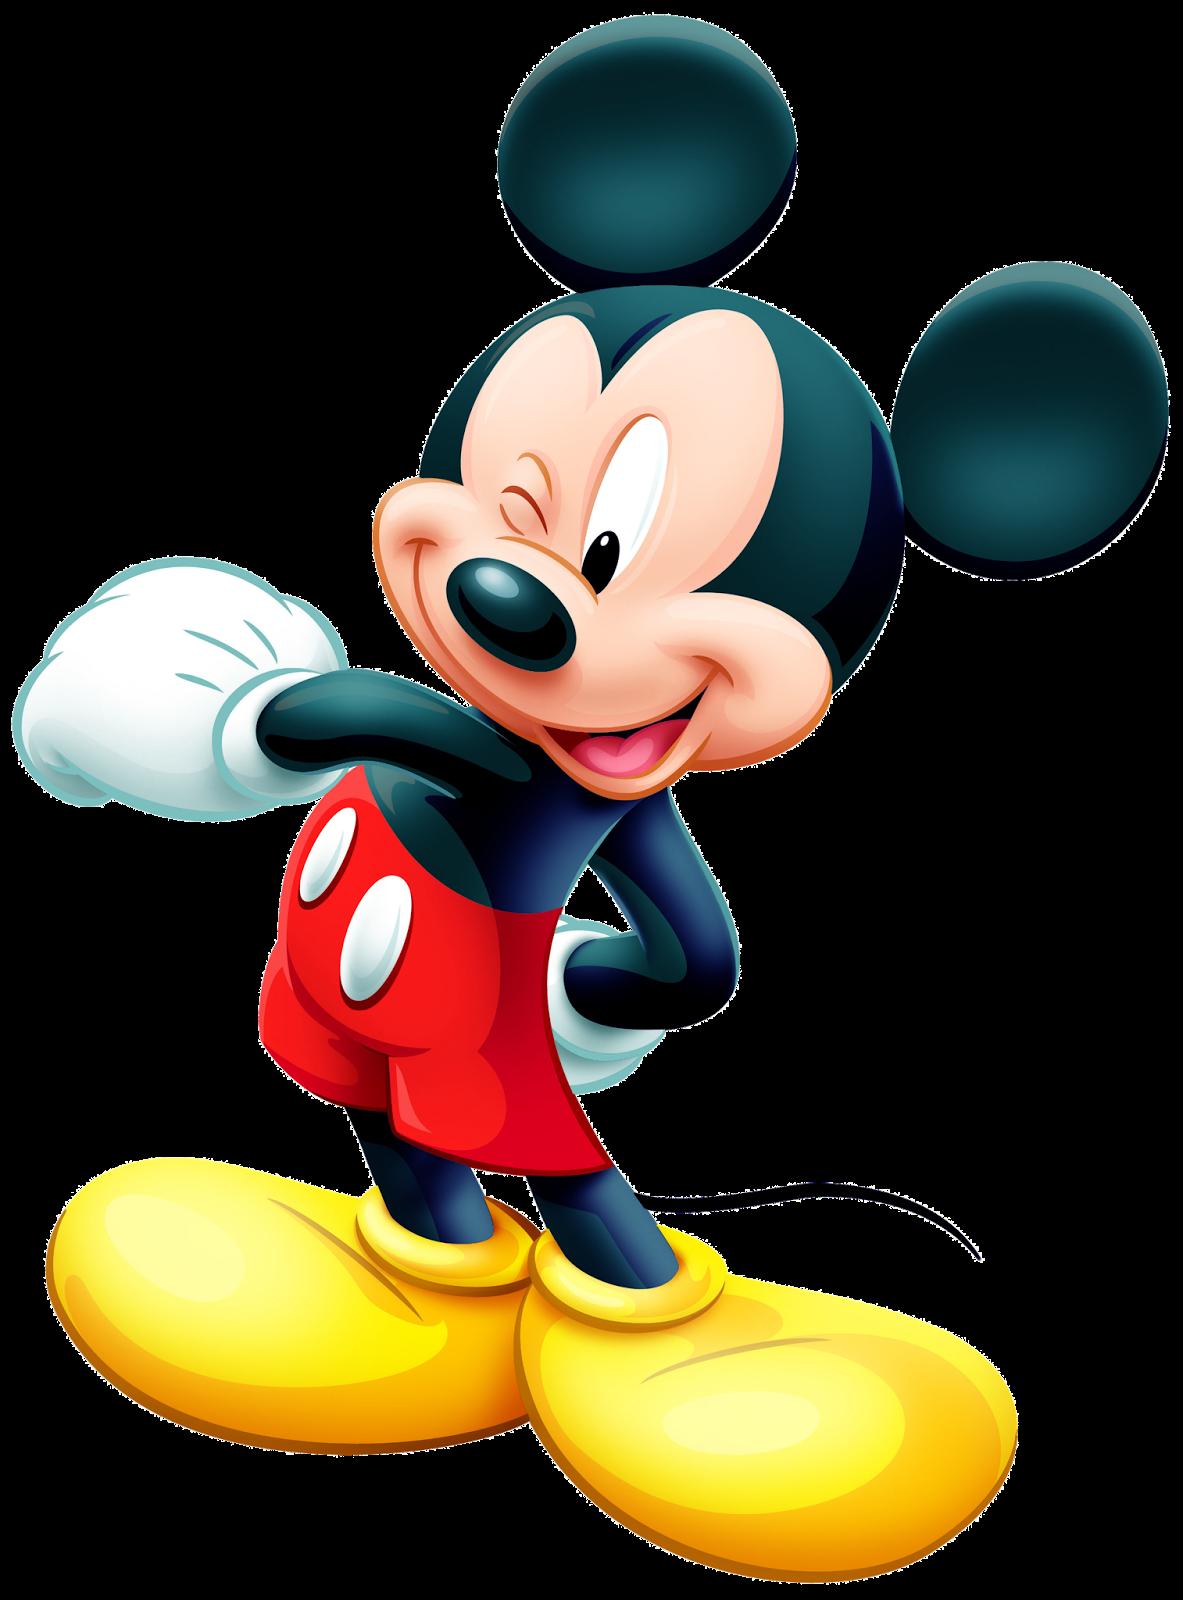 Rock star mickey mouse clipart clip art stock Mickey-2-psd16624.png (1183×1600) | Aniversário | Pinterest ... clip art stock